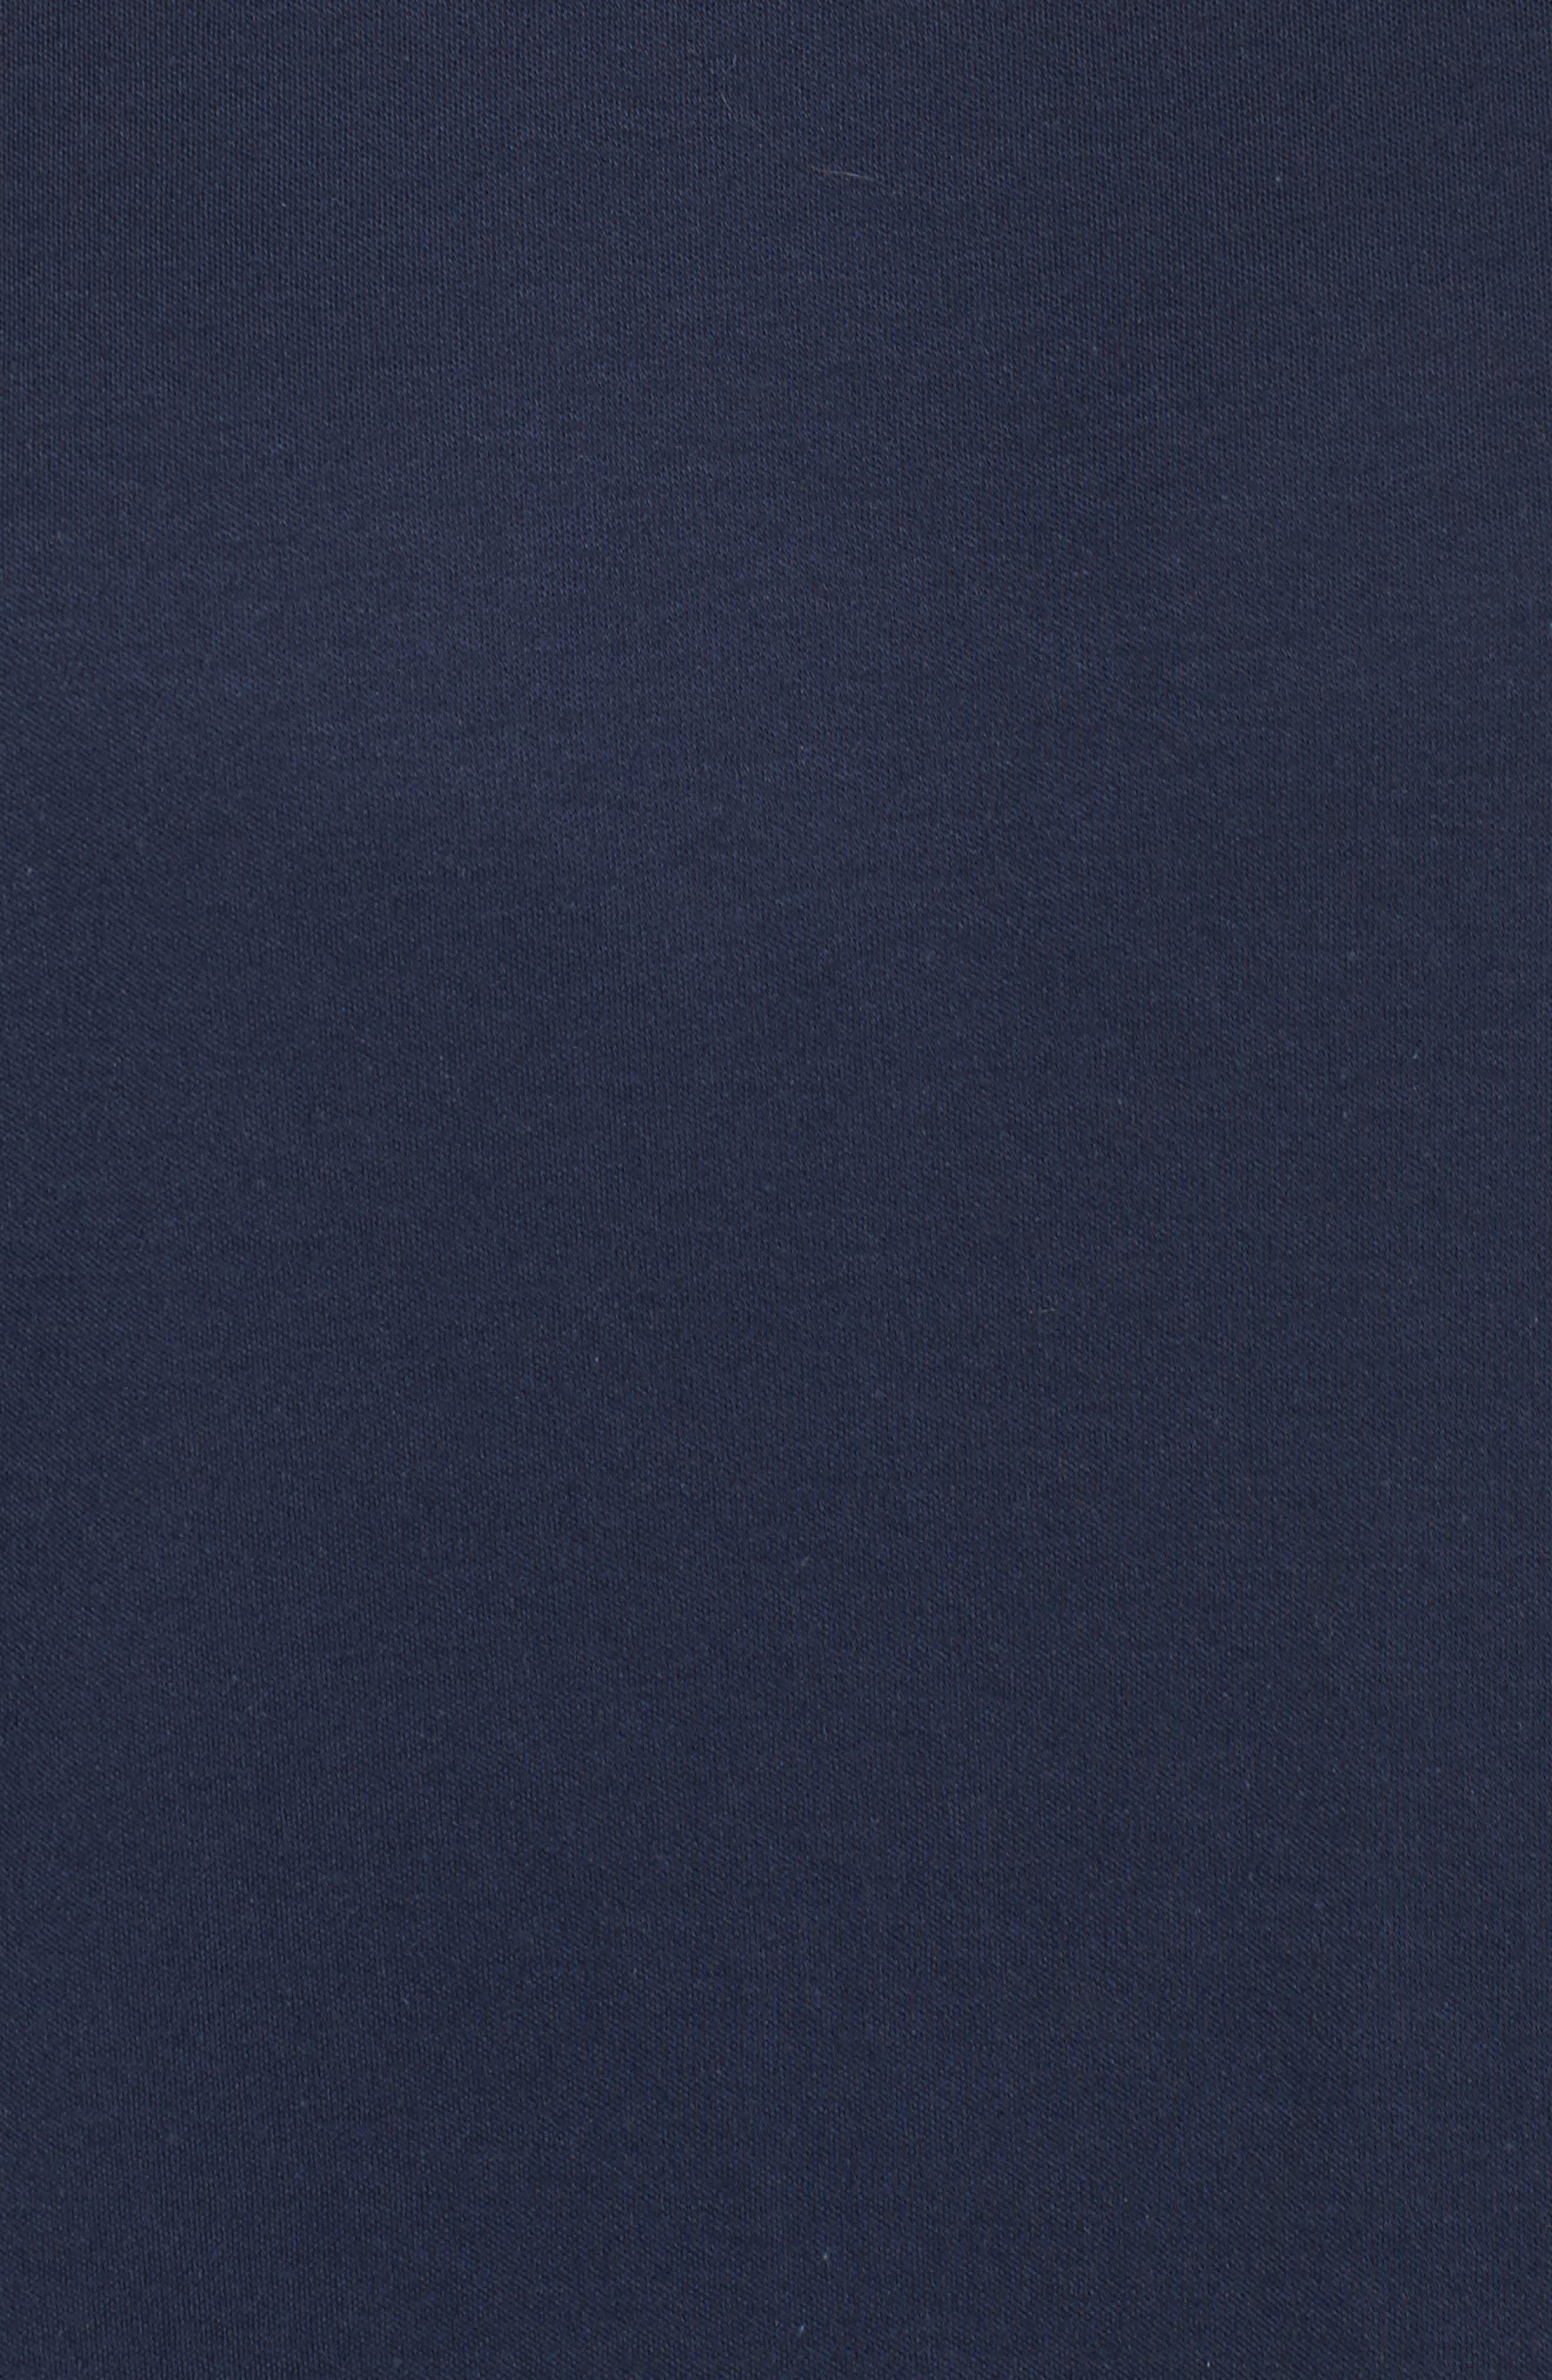 Enie Cotton Nightgown,                             Alternate thumbnail 5, color,